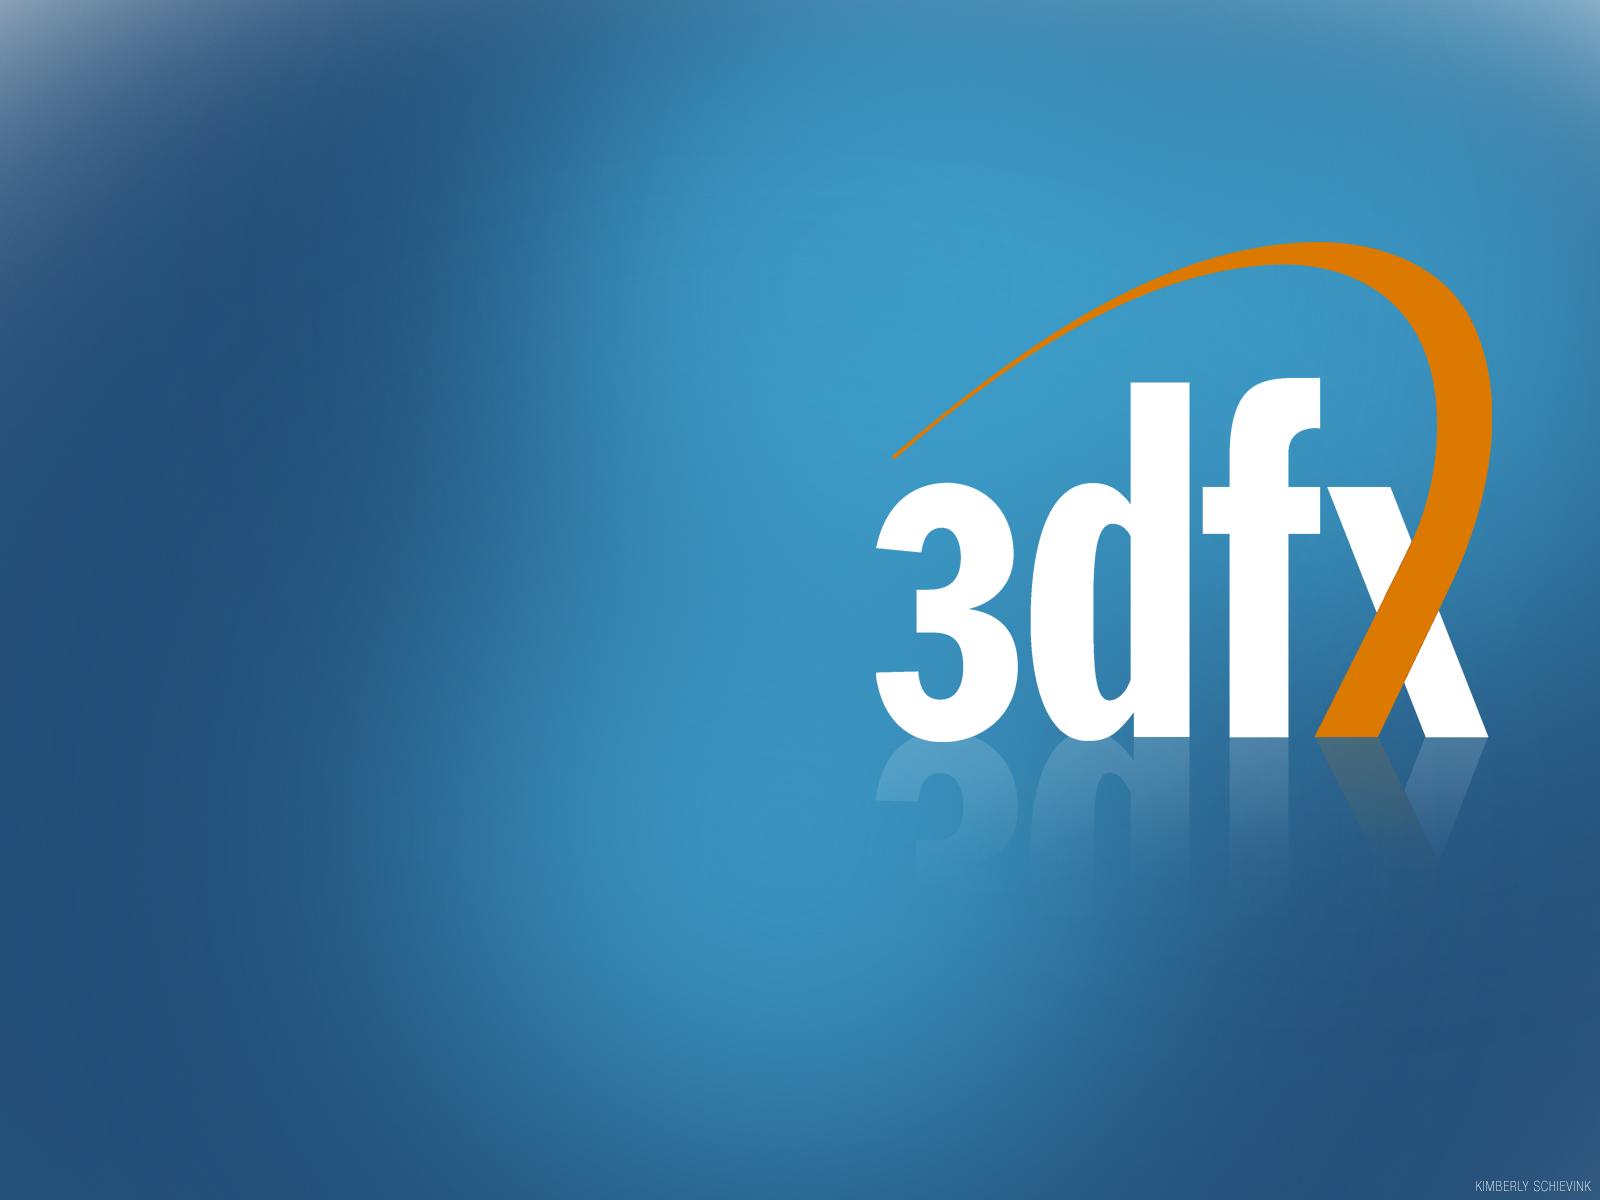 Some 3DFX wallpapers   3dfxzoneit WorldWide Community 1600x1200